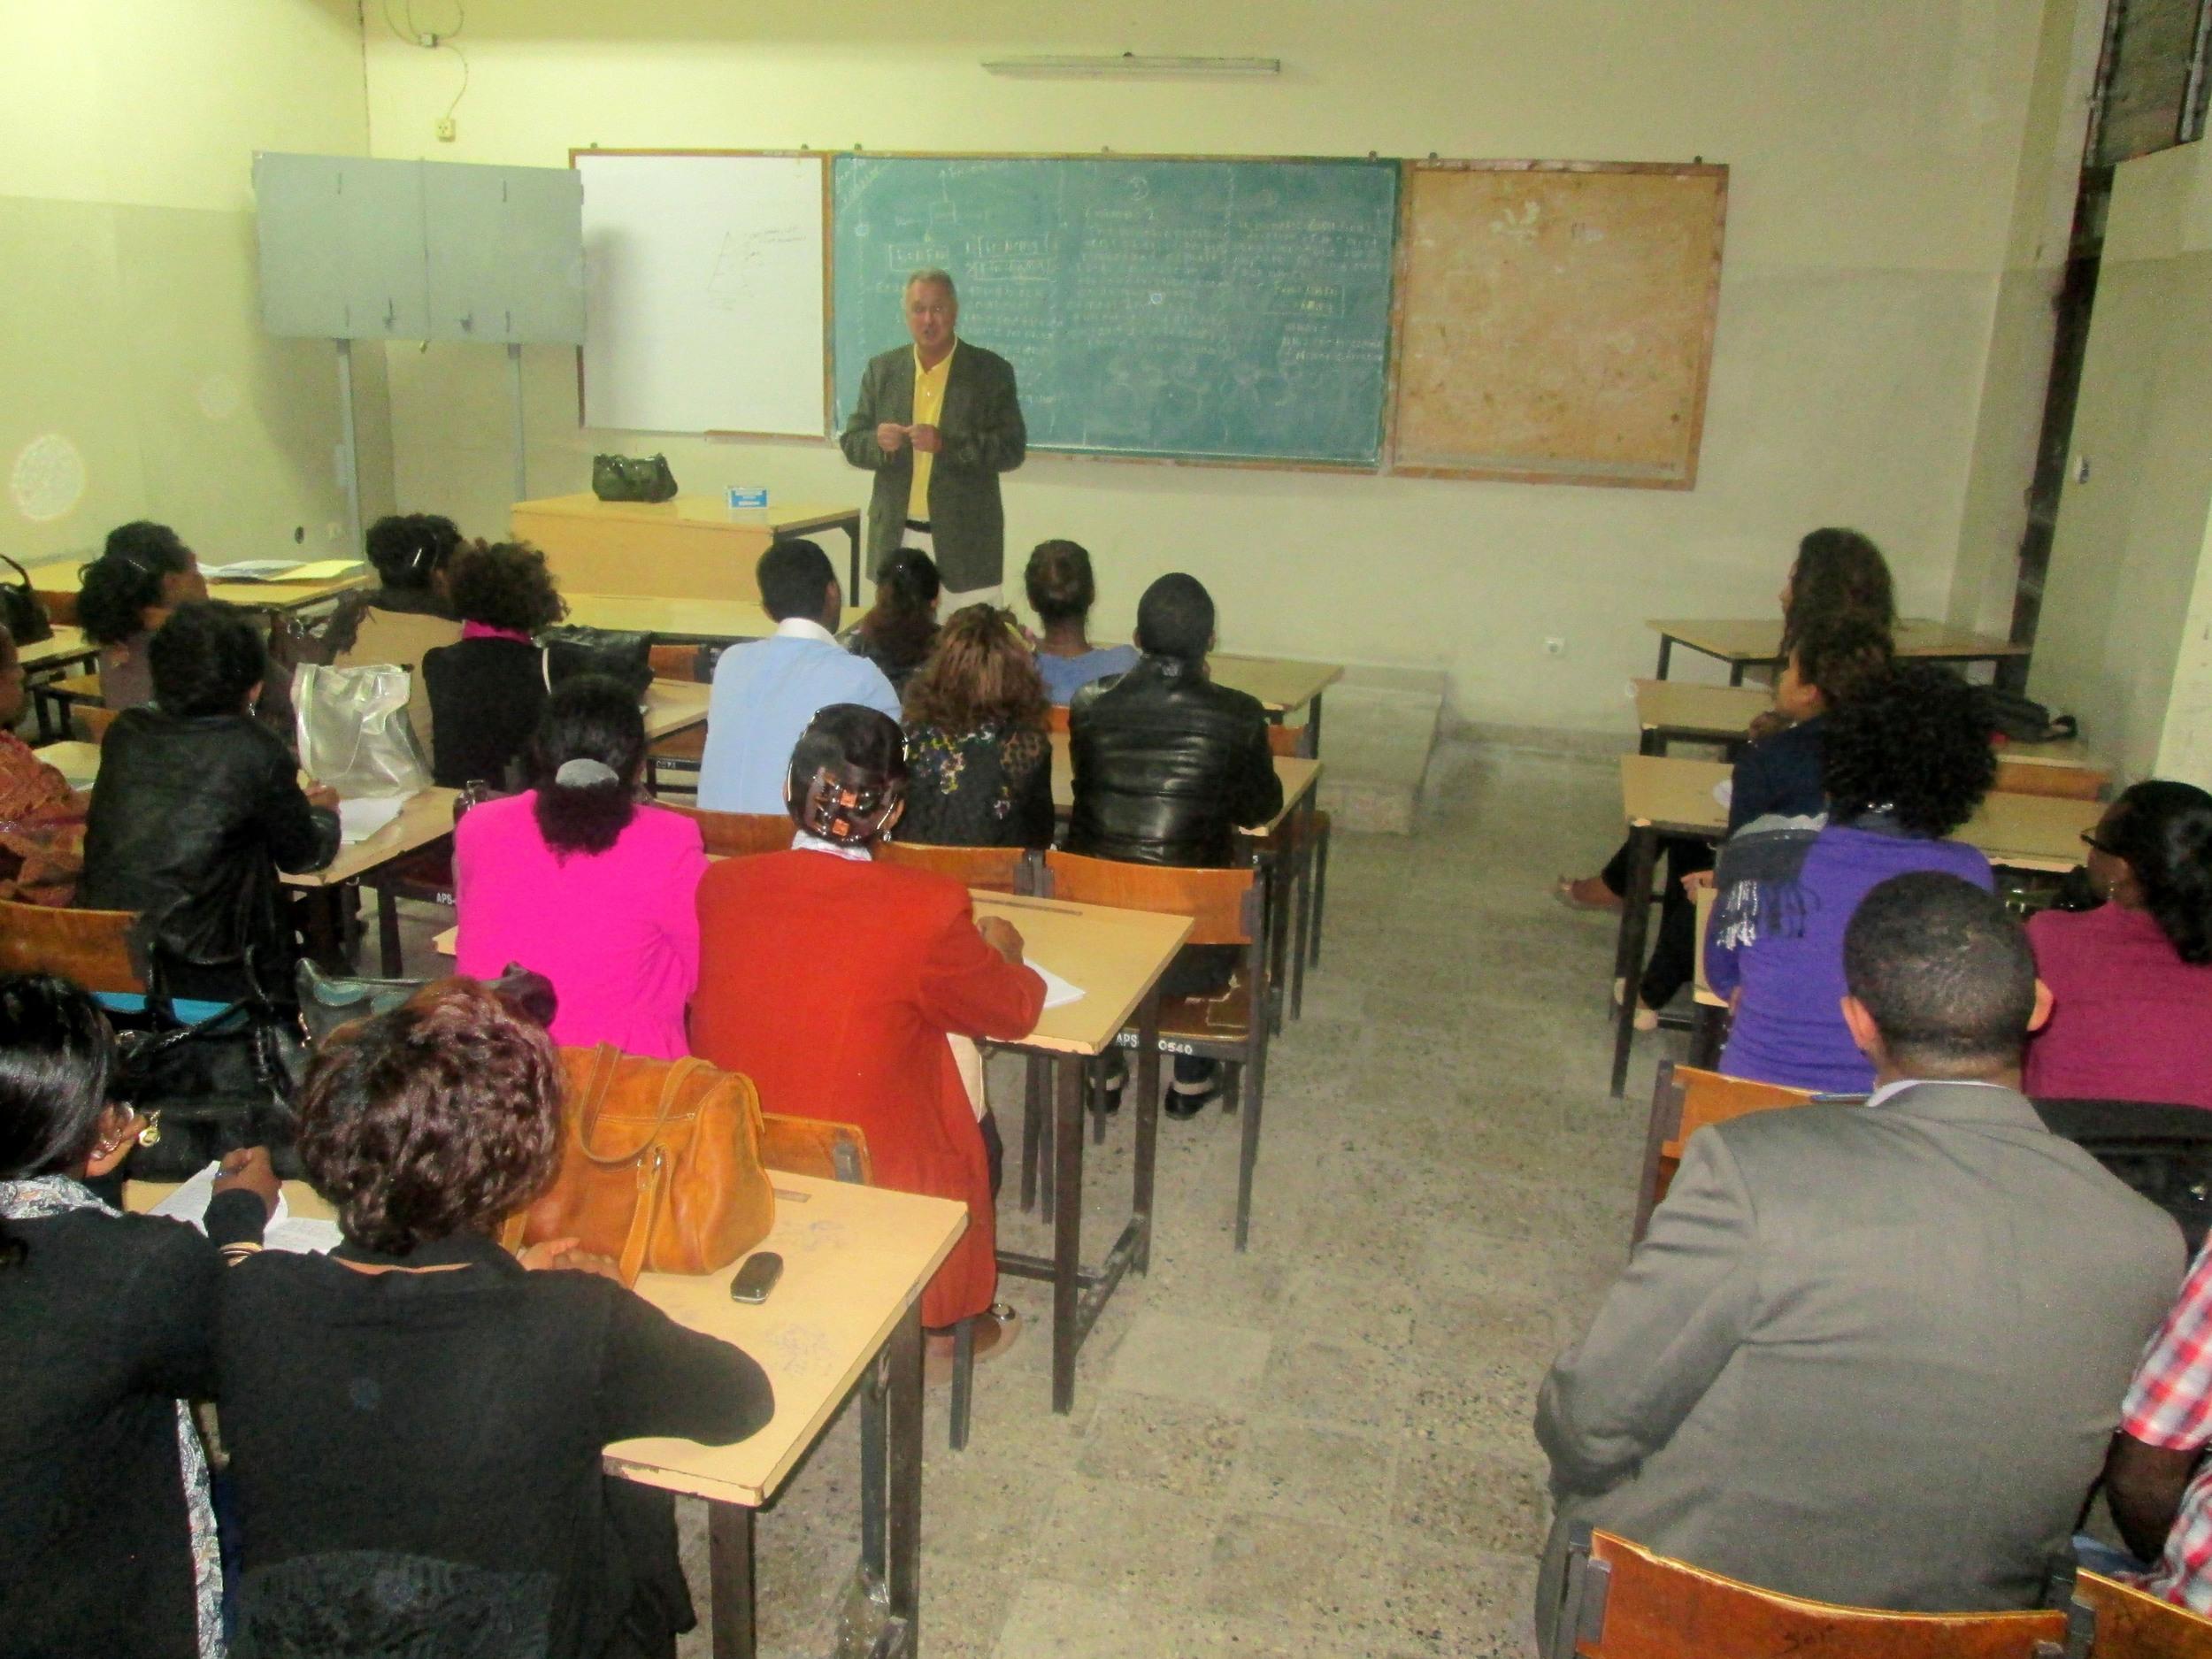 PJB III INSTRUCTING STUDENTS AT ADMAS UNIVERSITY